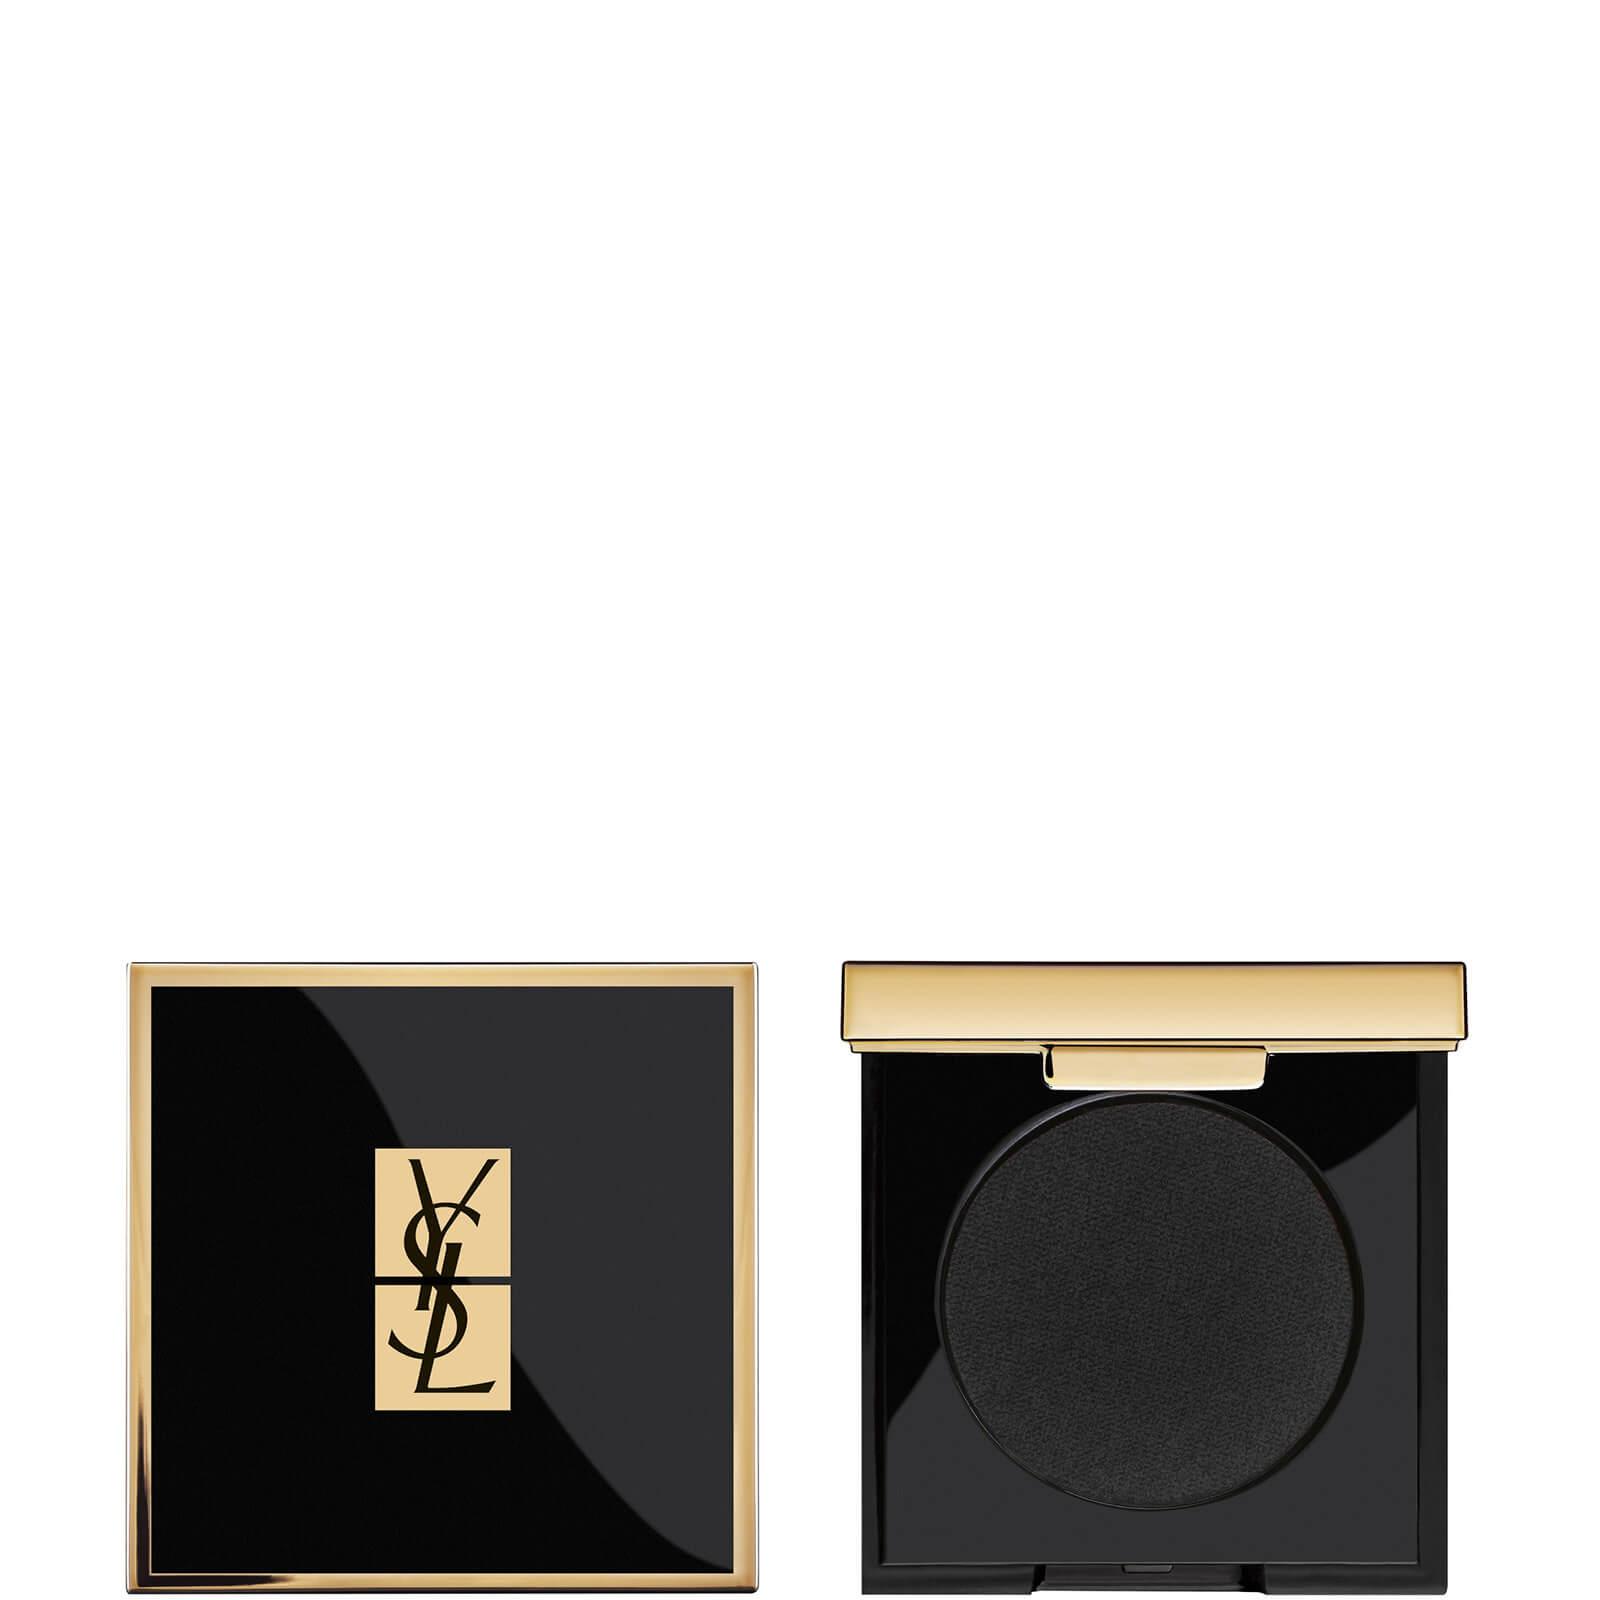 Купить Yves Saint Laurent Exclusive Couture Crush Mono Eyeshadow 10g (Various Shades) - #32